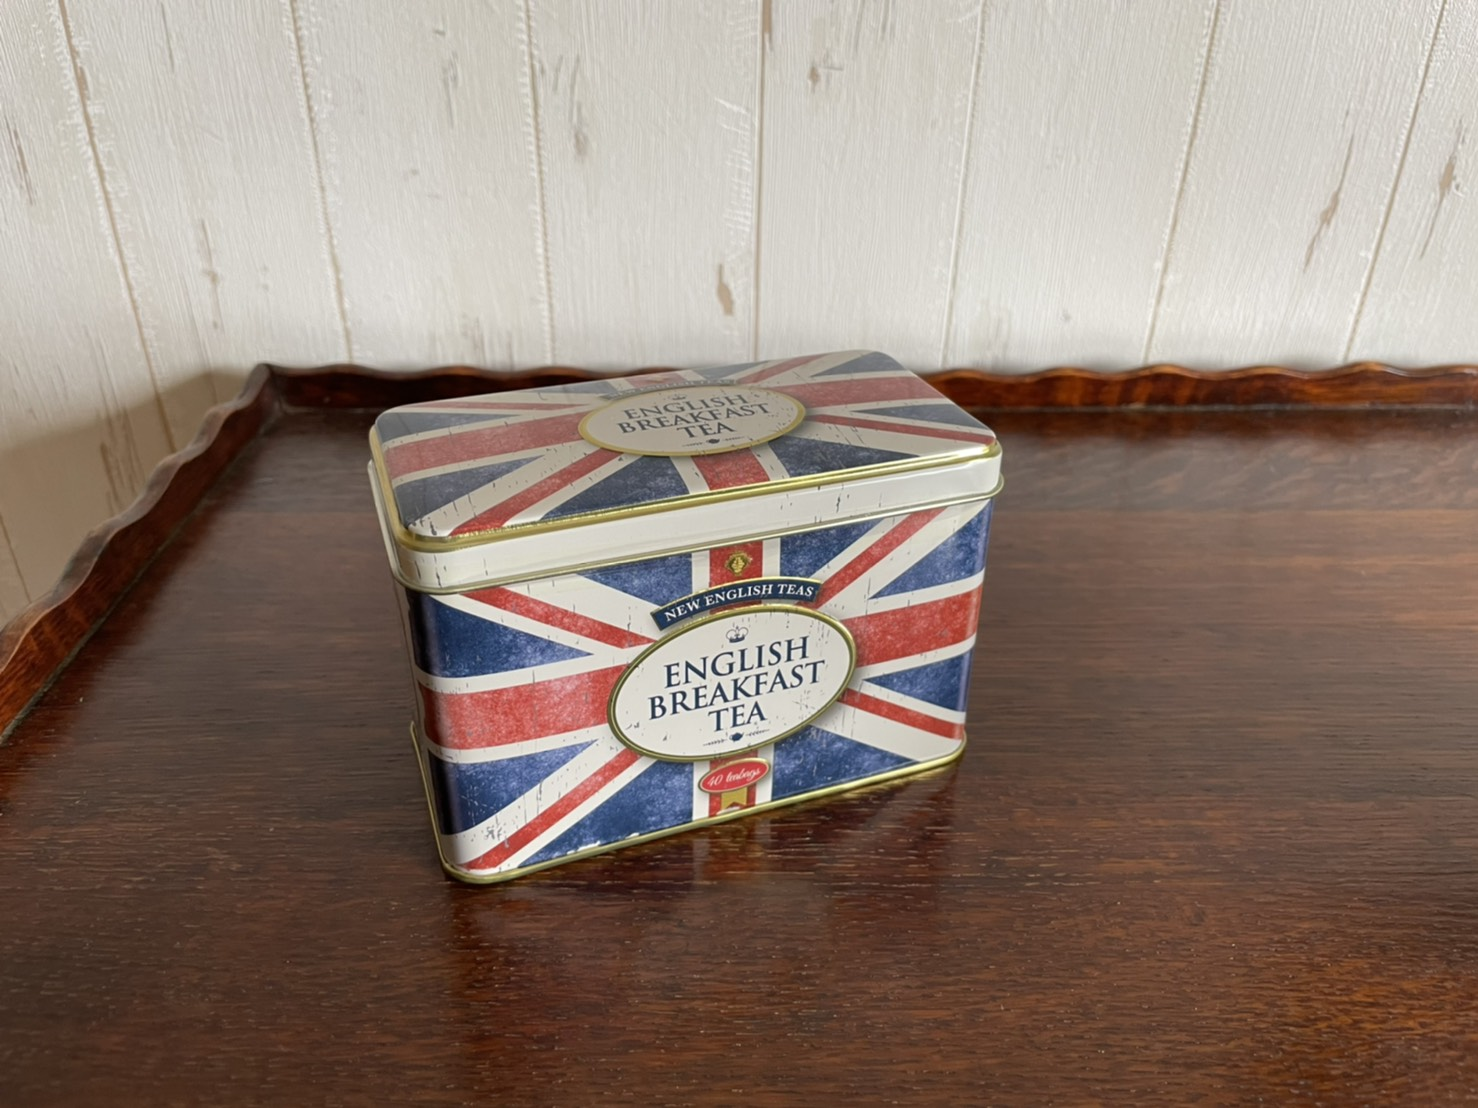 NEW ENGLISH TEA